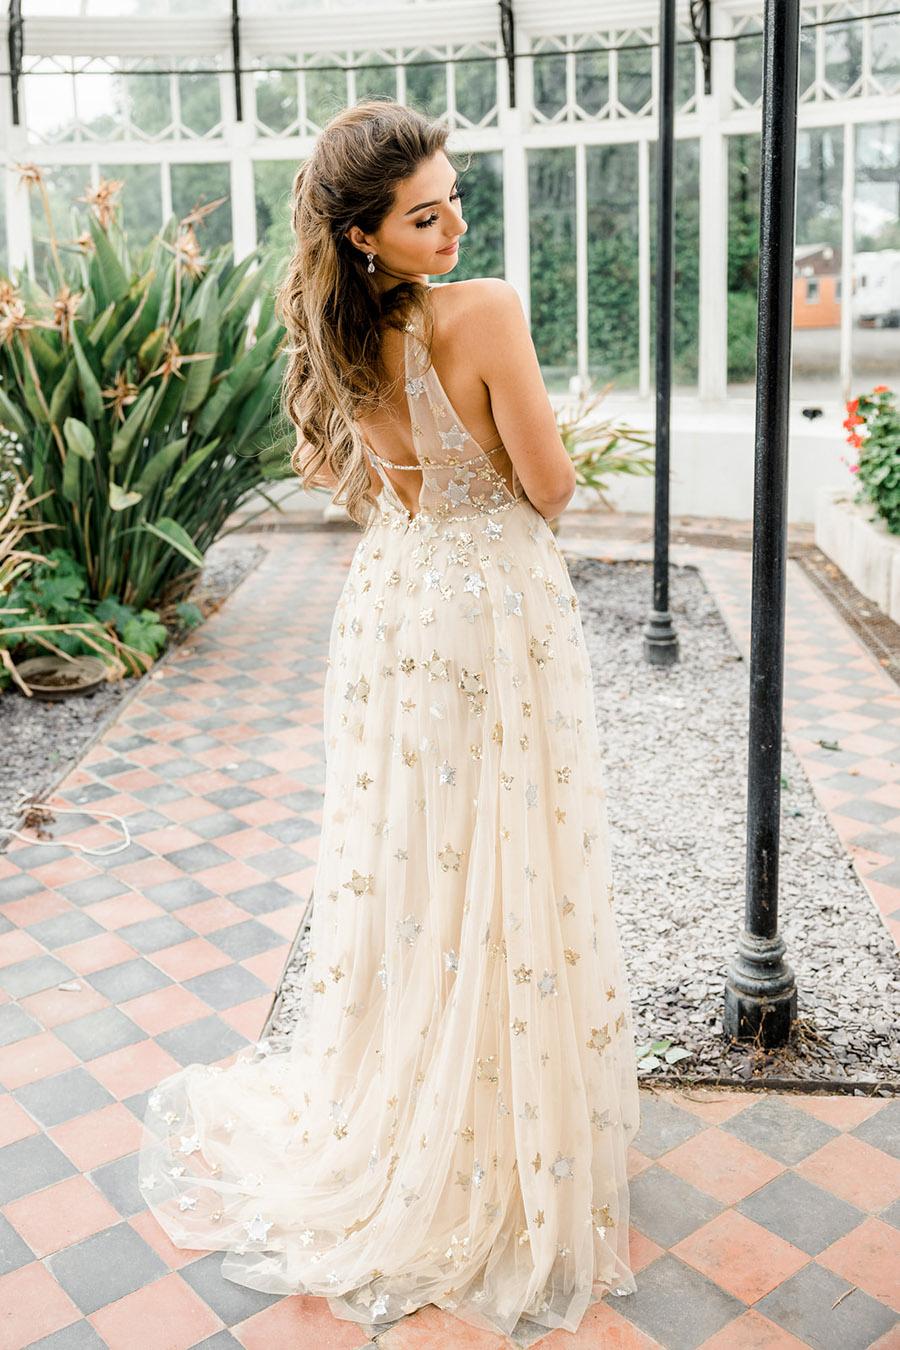 Modern Boho wedding style inspiration from Slindon House, photographer credit Kelsie Scully Photography (45)